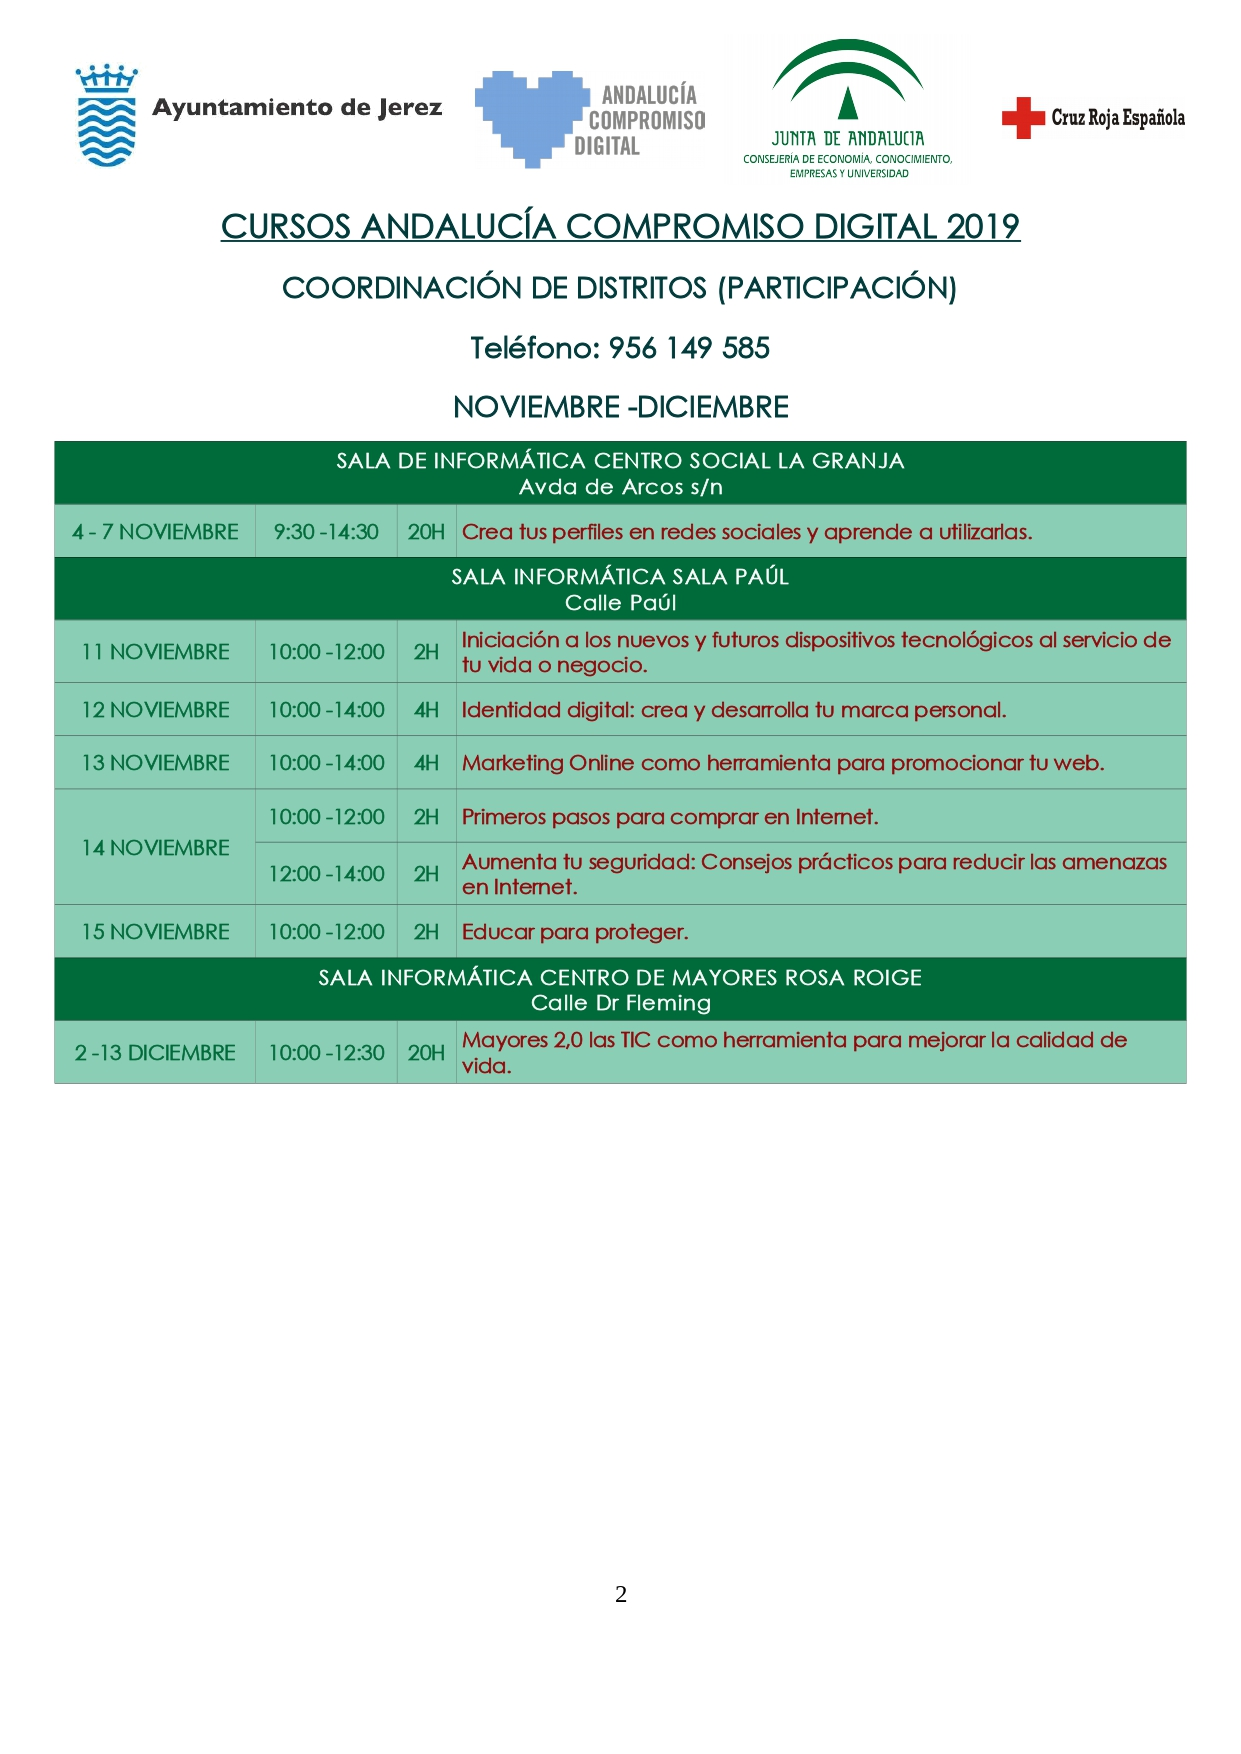 Cursos Andalucía Compromiso Digital. Tercer trimestre 2019. La Granja, Sala Paúl y Rosa Roige